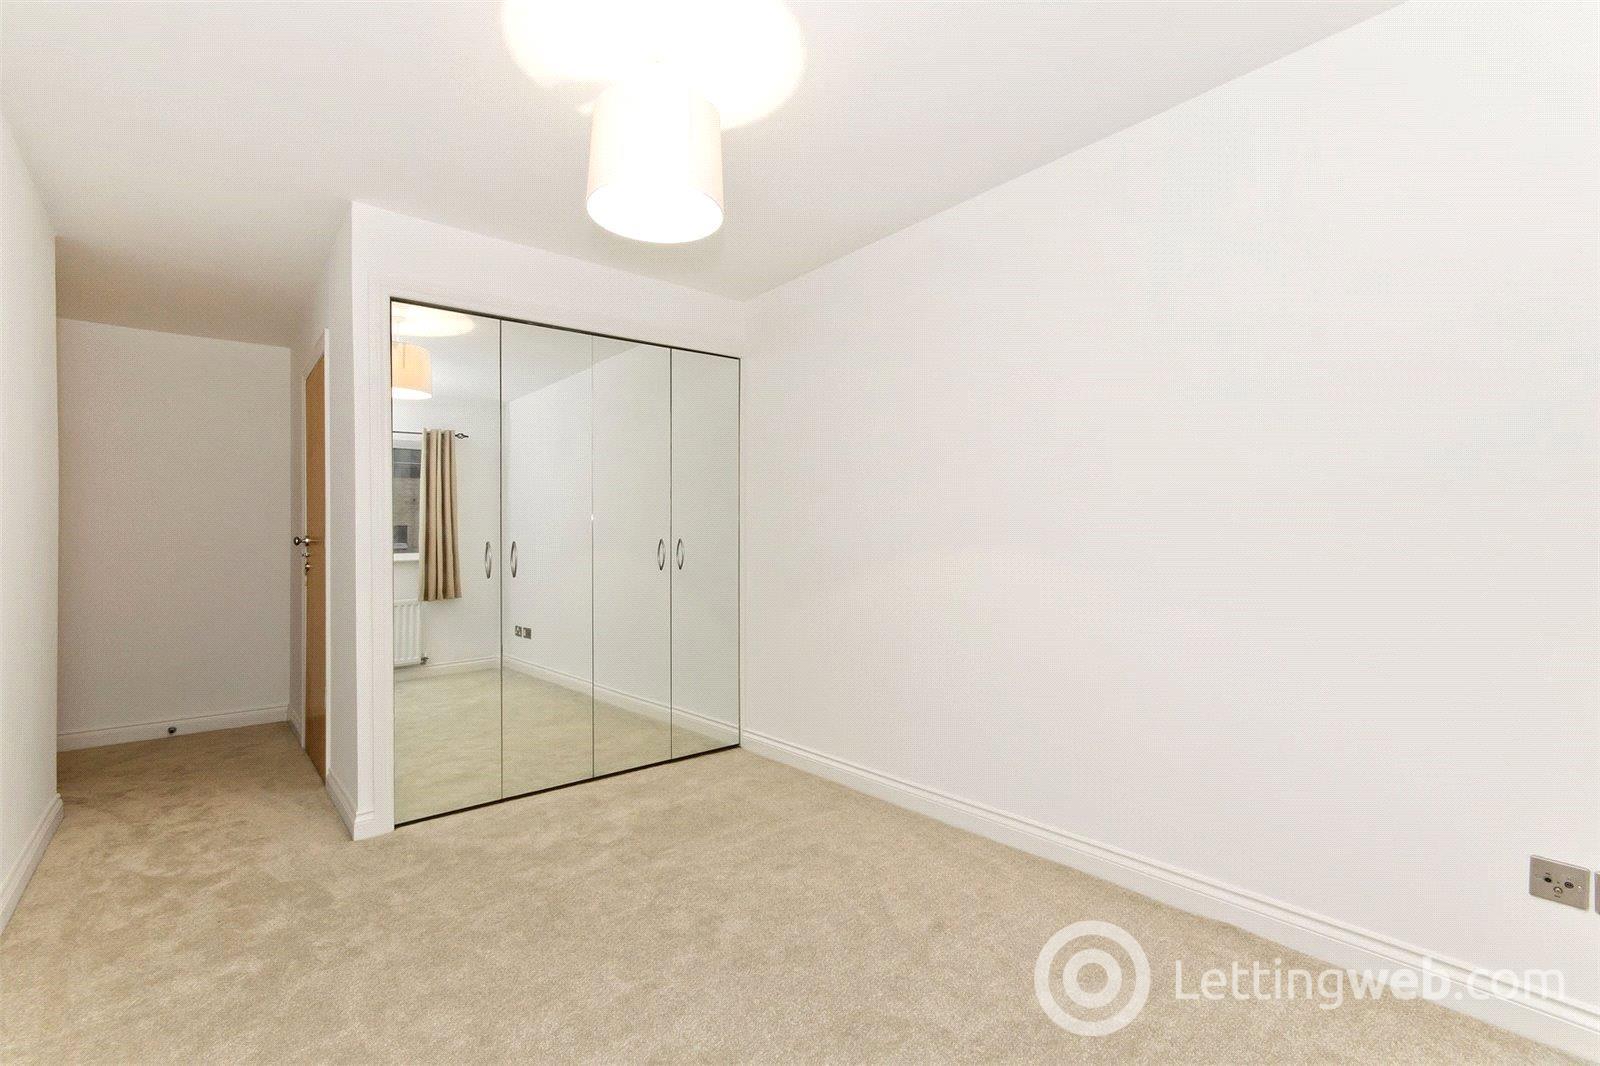 Property to rent in 2/3, 32 Minerva Way, Finnieston, Glasgow, G3